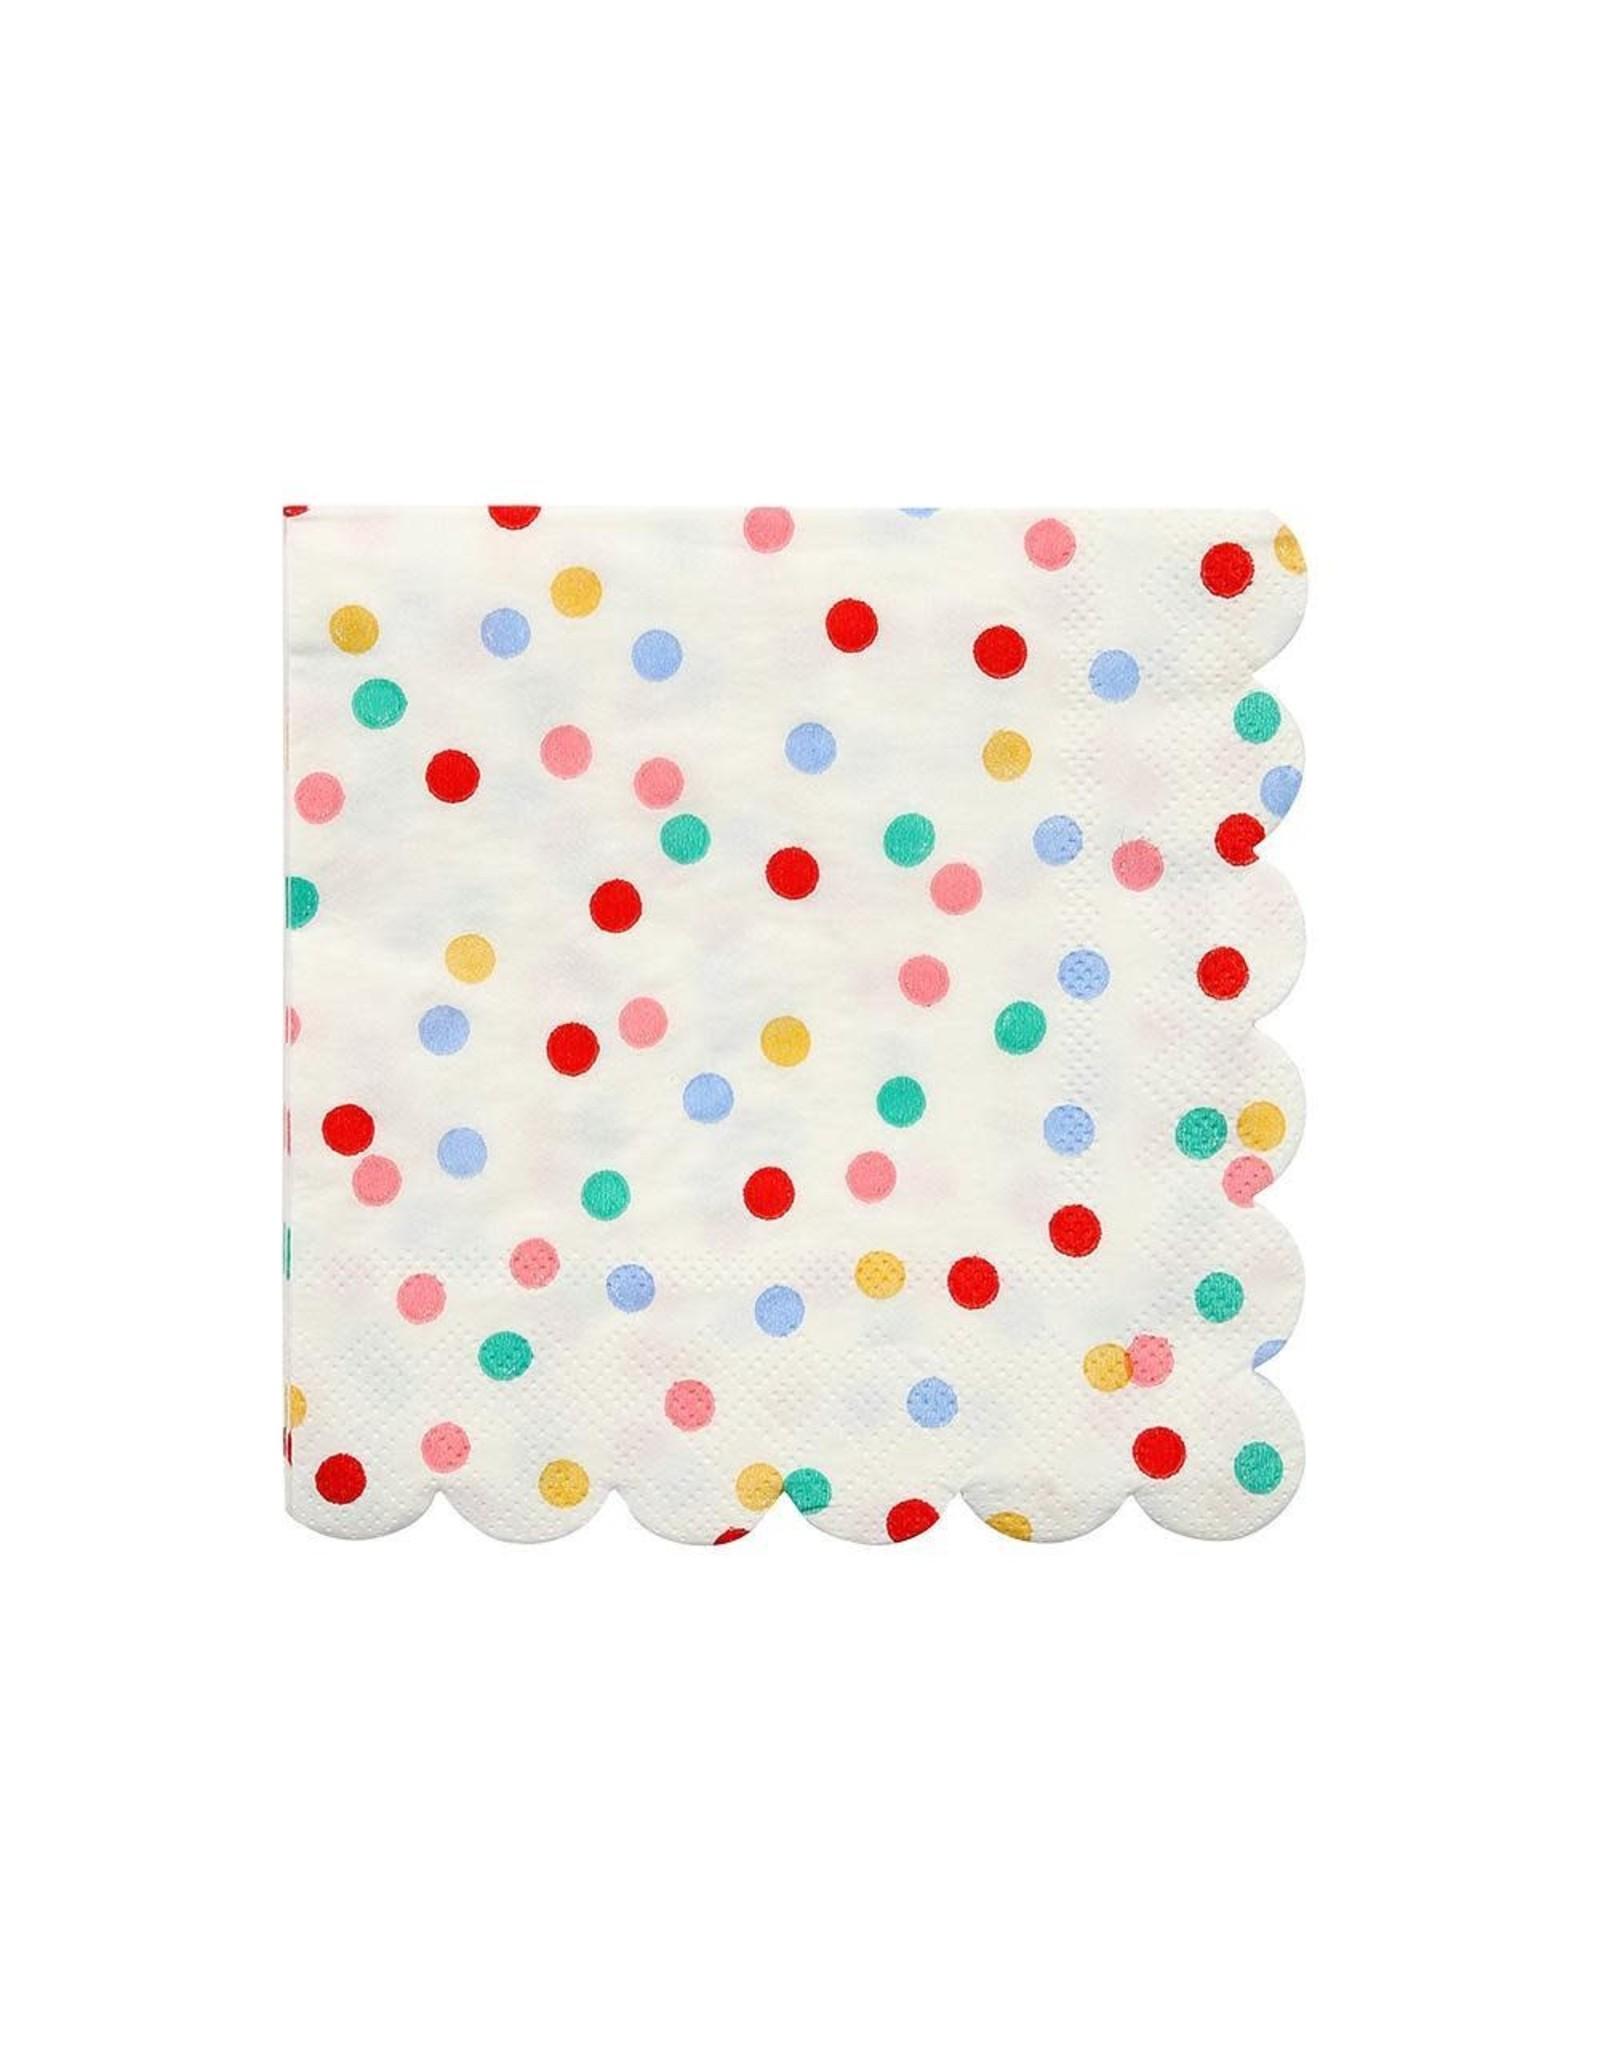 Meri Meri Serviettes | Confetti | 16st | 10 x 10cm